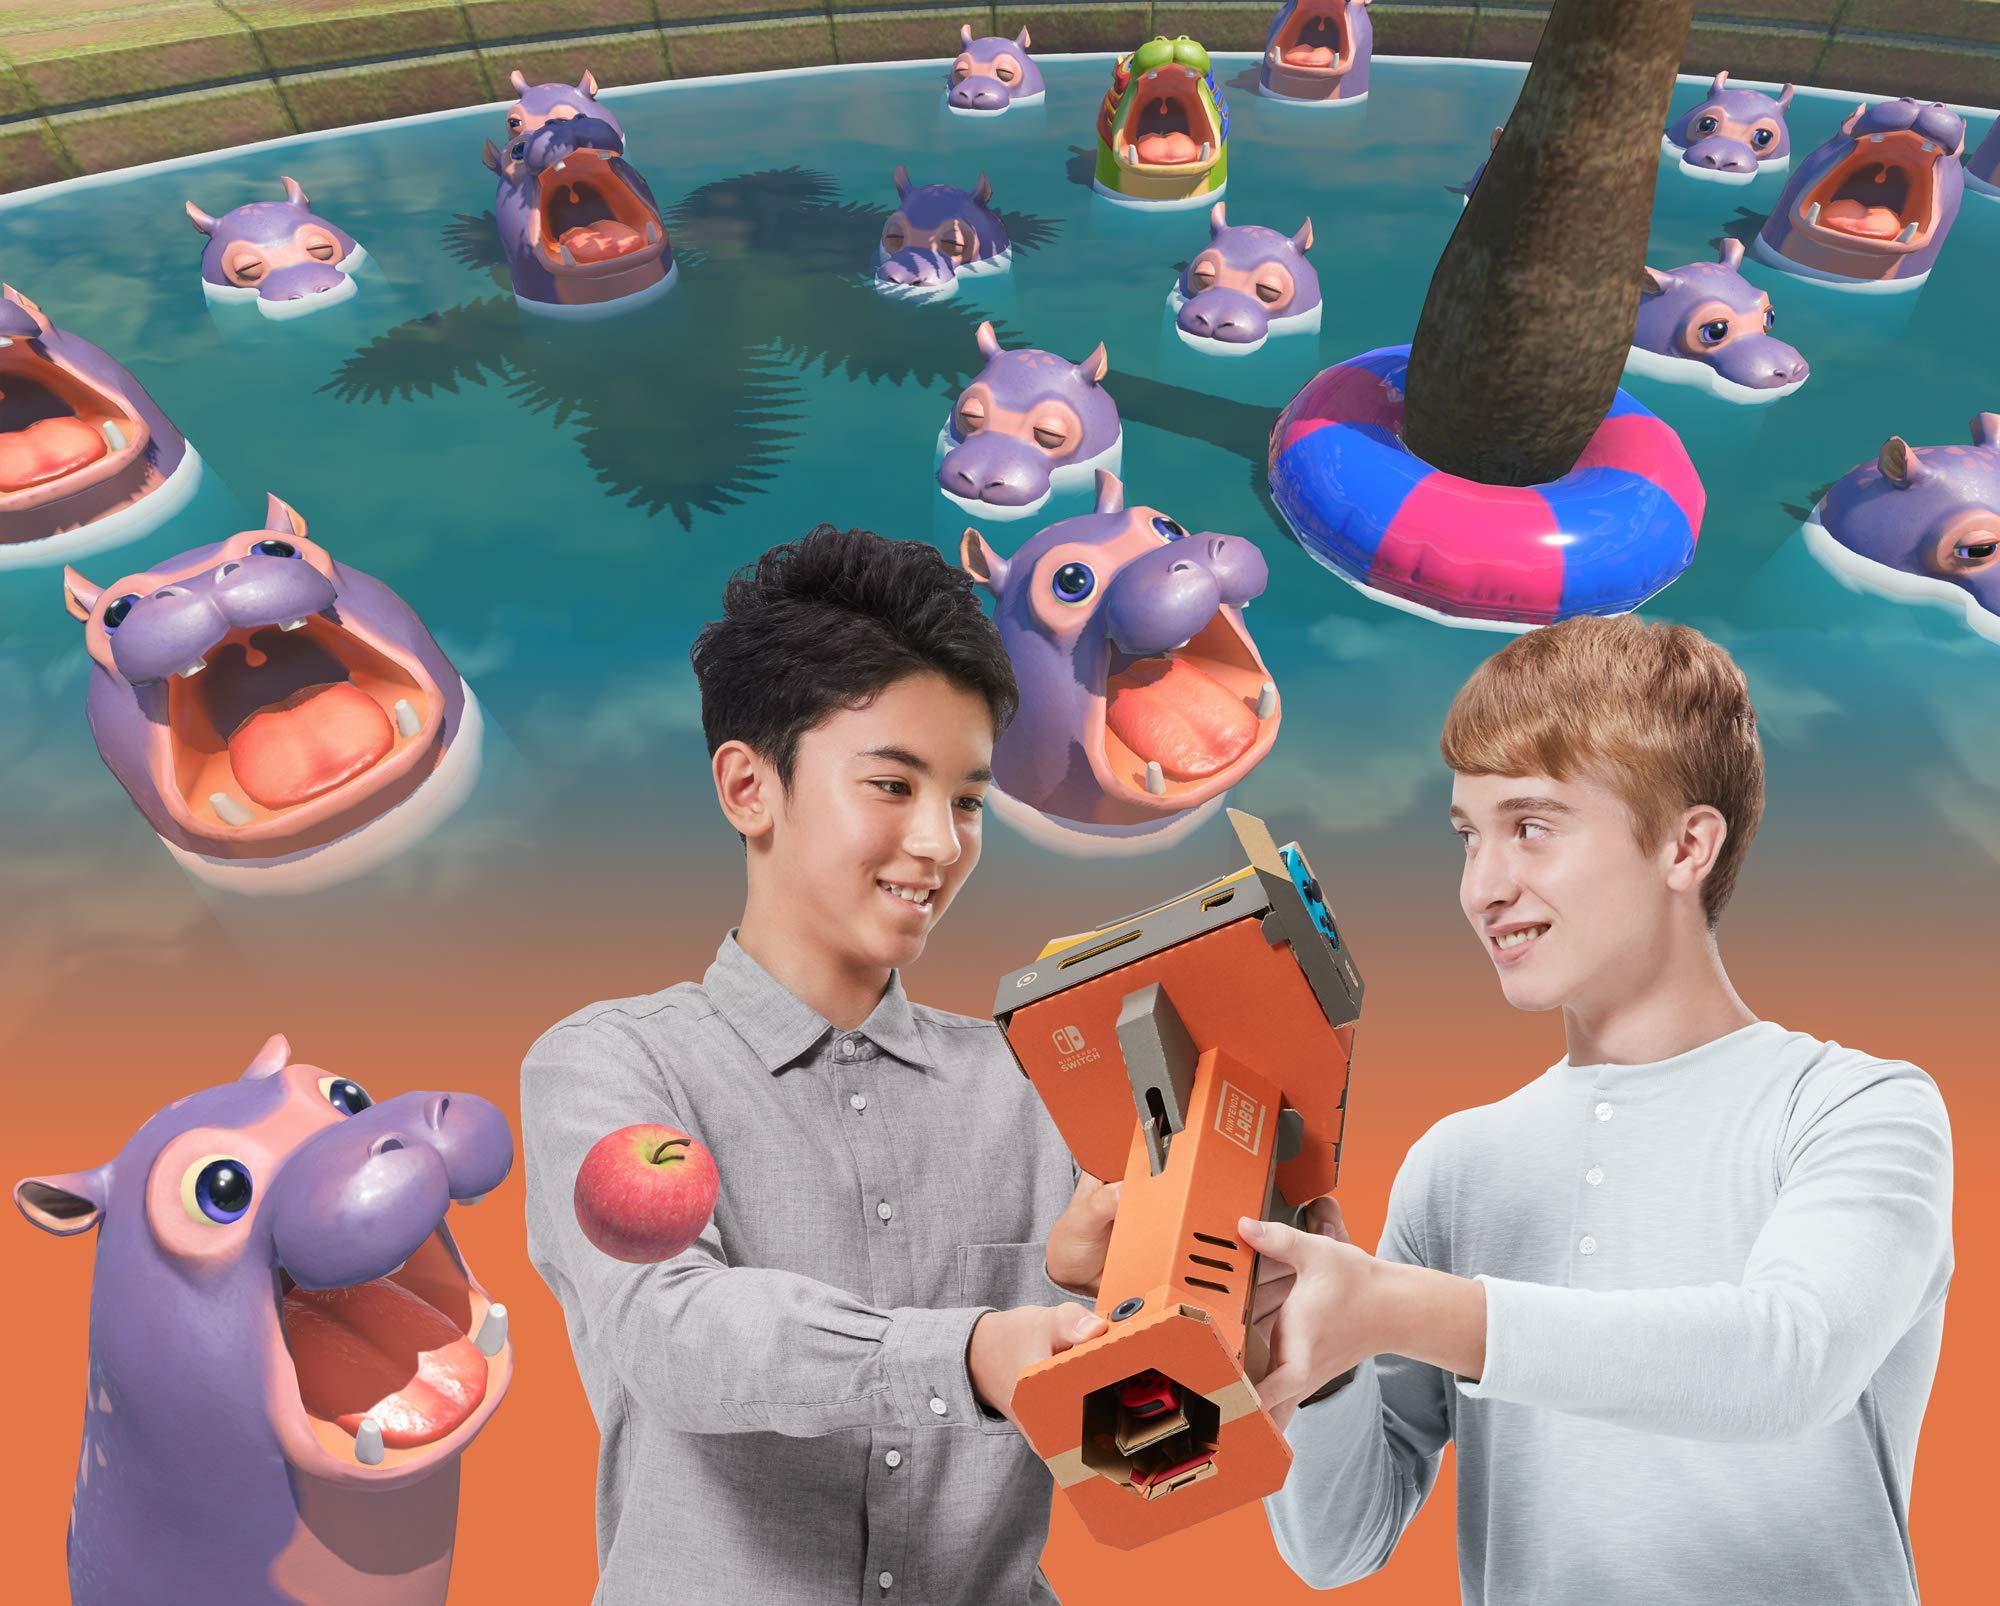 Nintendo Labo Toy-Con 04: VR Kit - Starter Set + Blaster - Switch by Nintendo (Image #8)